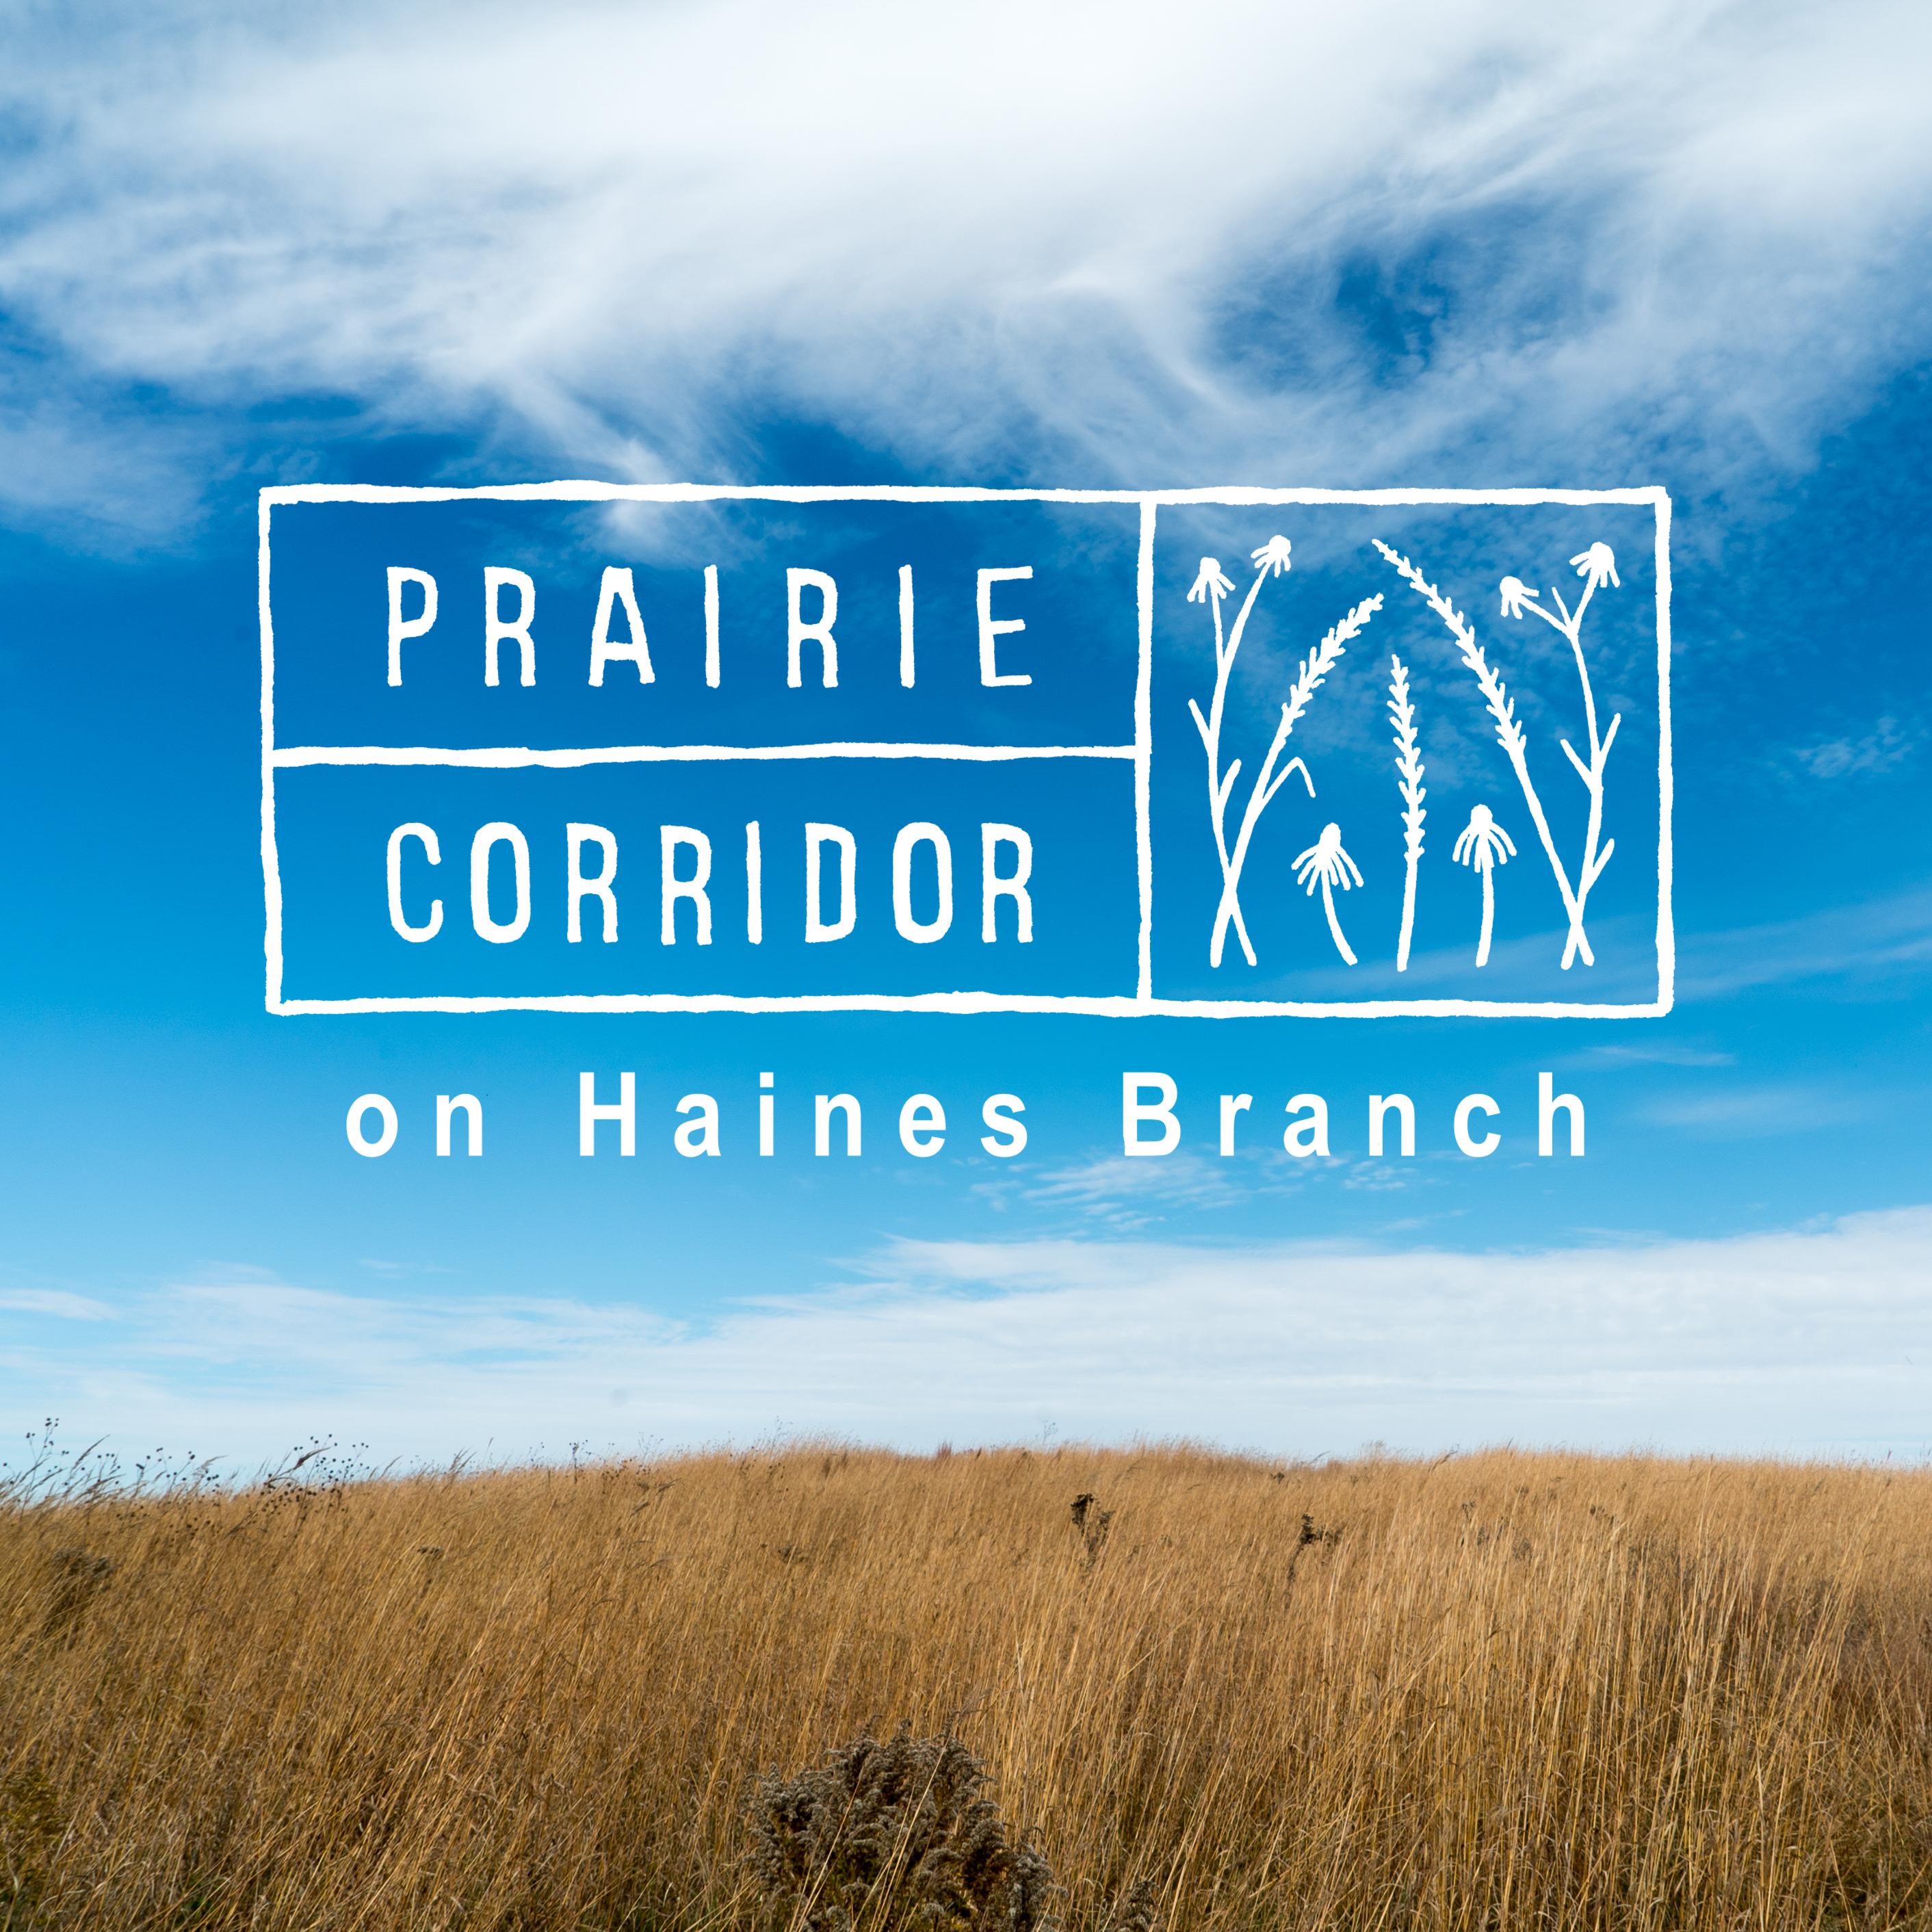 Haines Branch Prairie Corridor